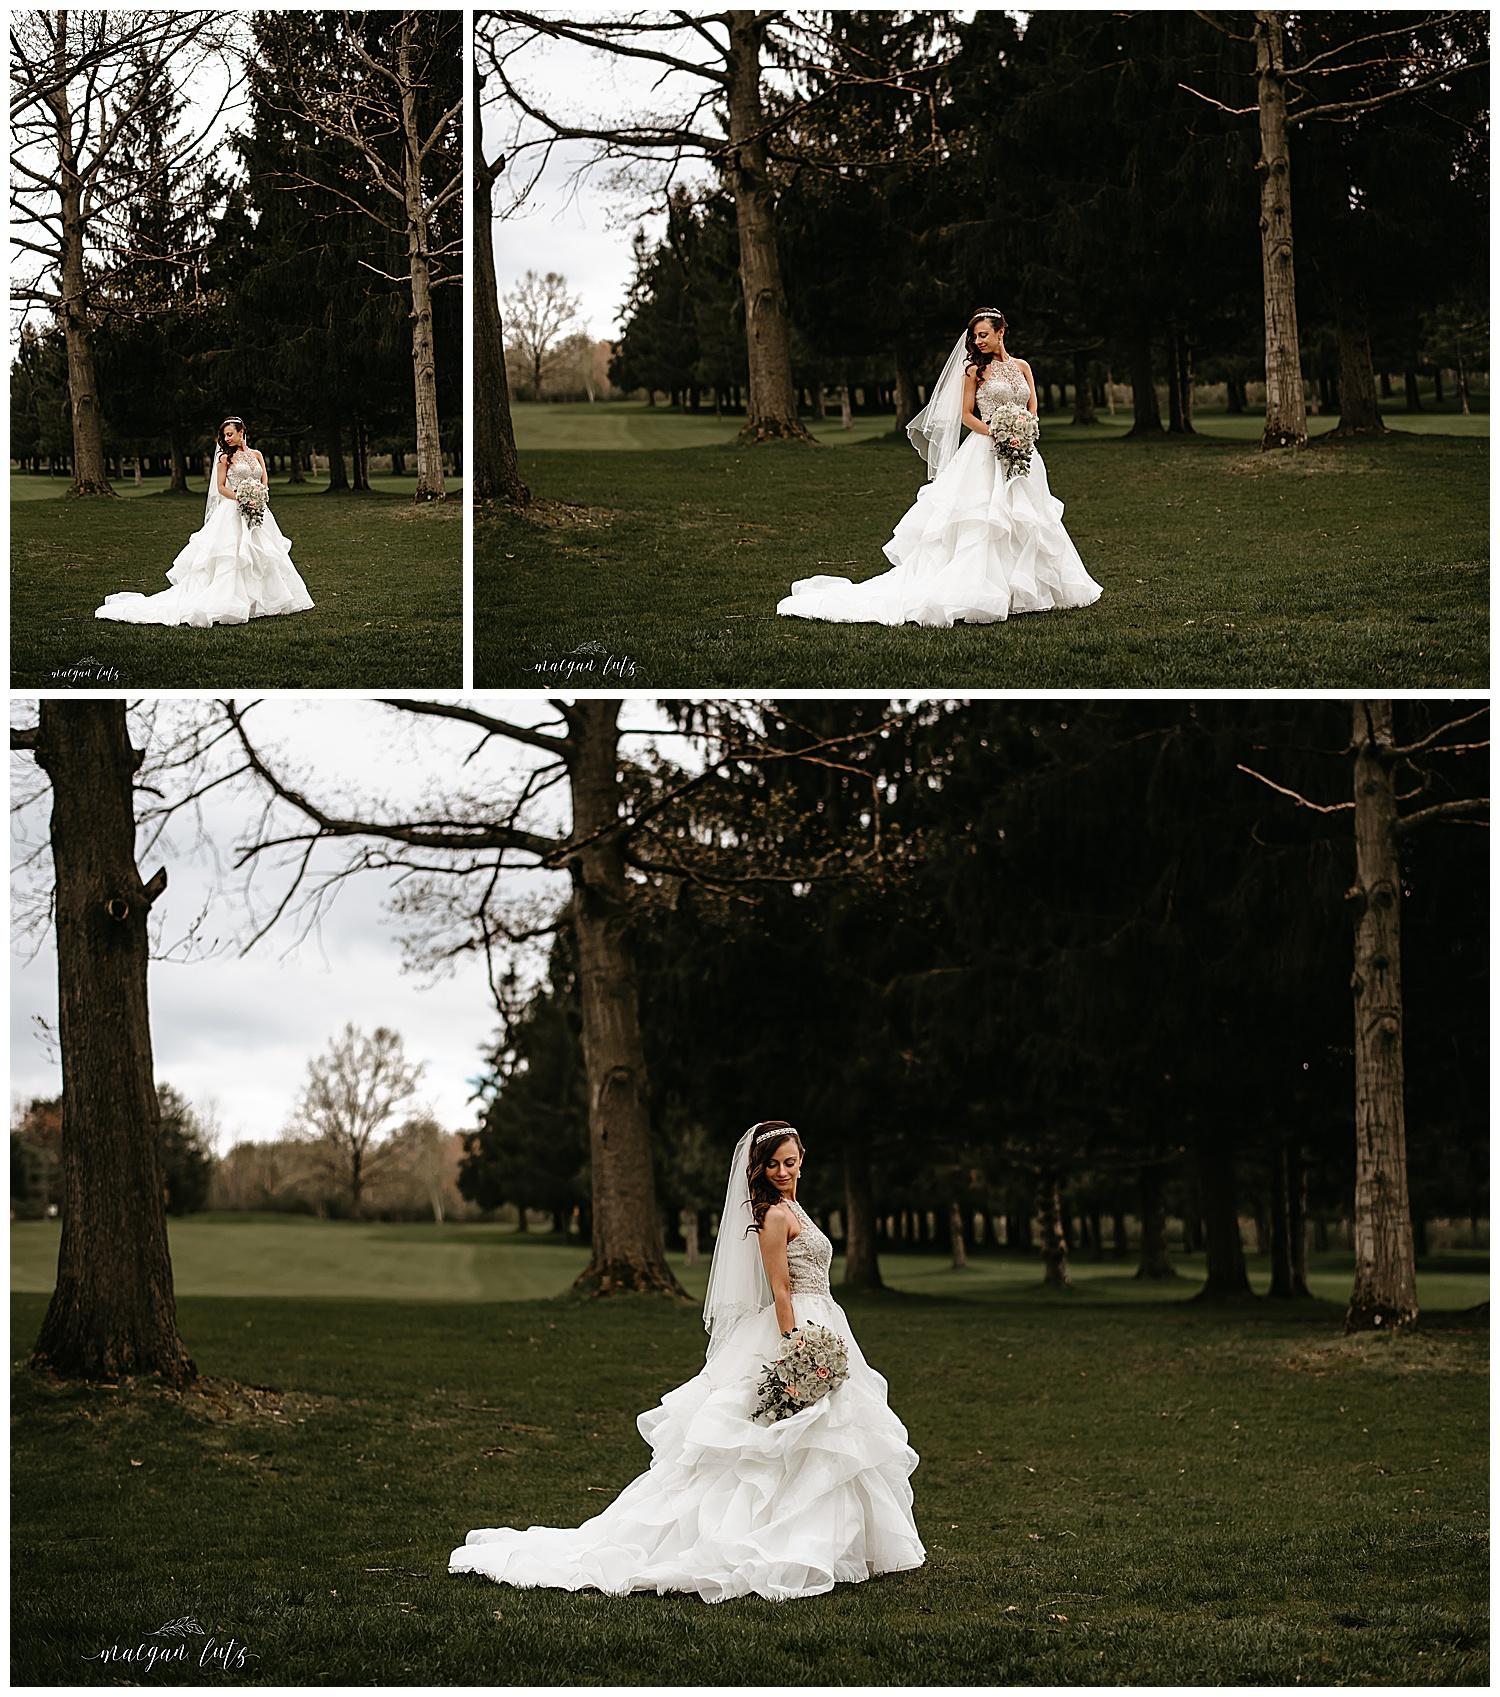 NEPA-Lehigh-Valley-Wedding-Photographer-at-Glen-Oak-Country-Club-Clarks-Summit-PA_0034.jpg